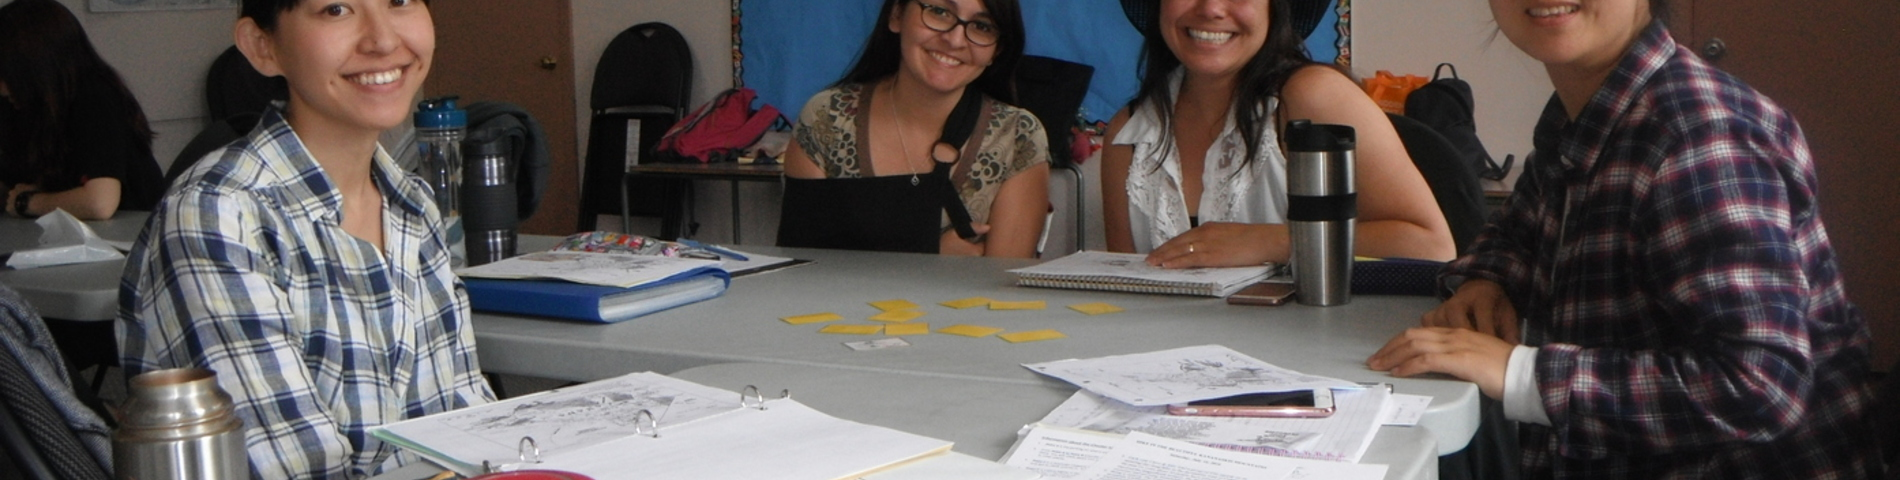 Calgary International Learning Centre图片1